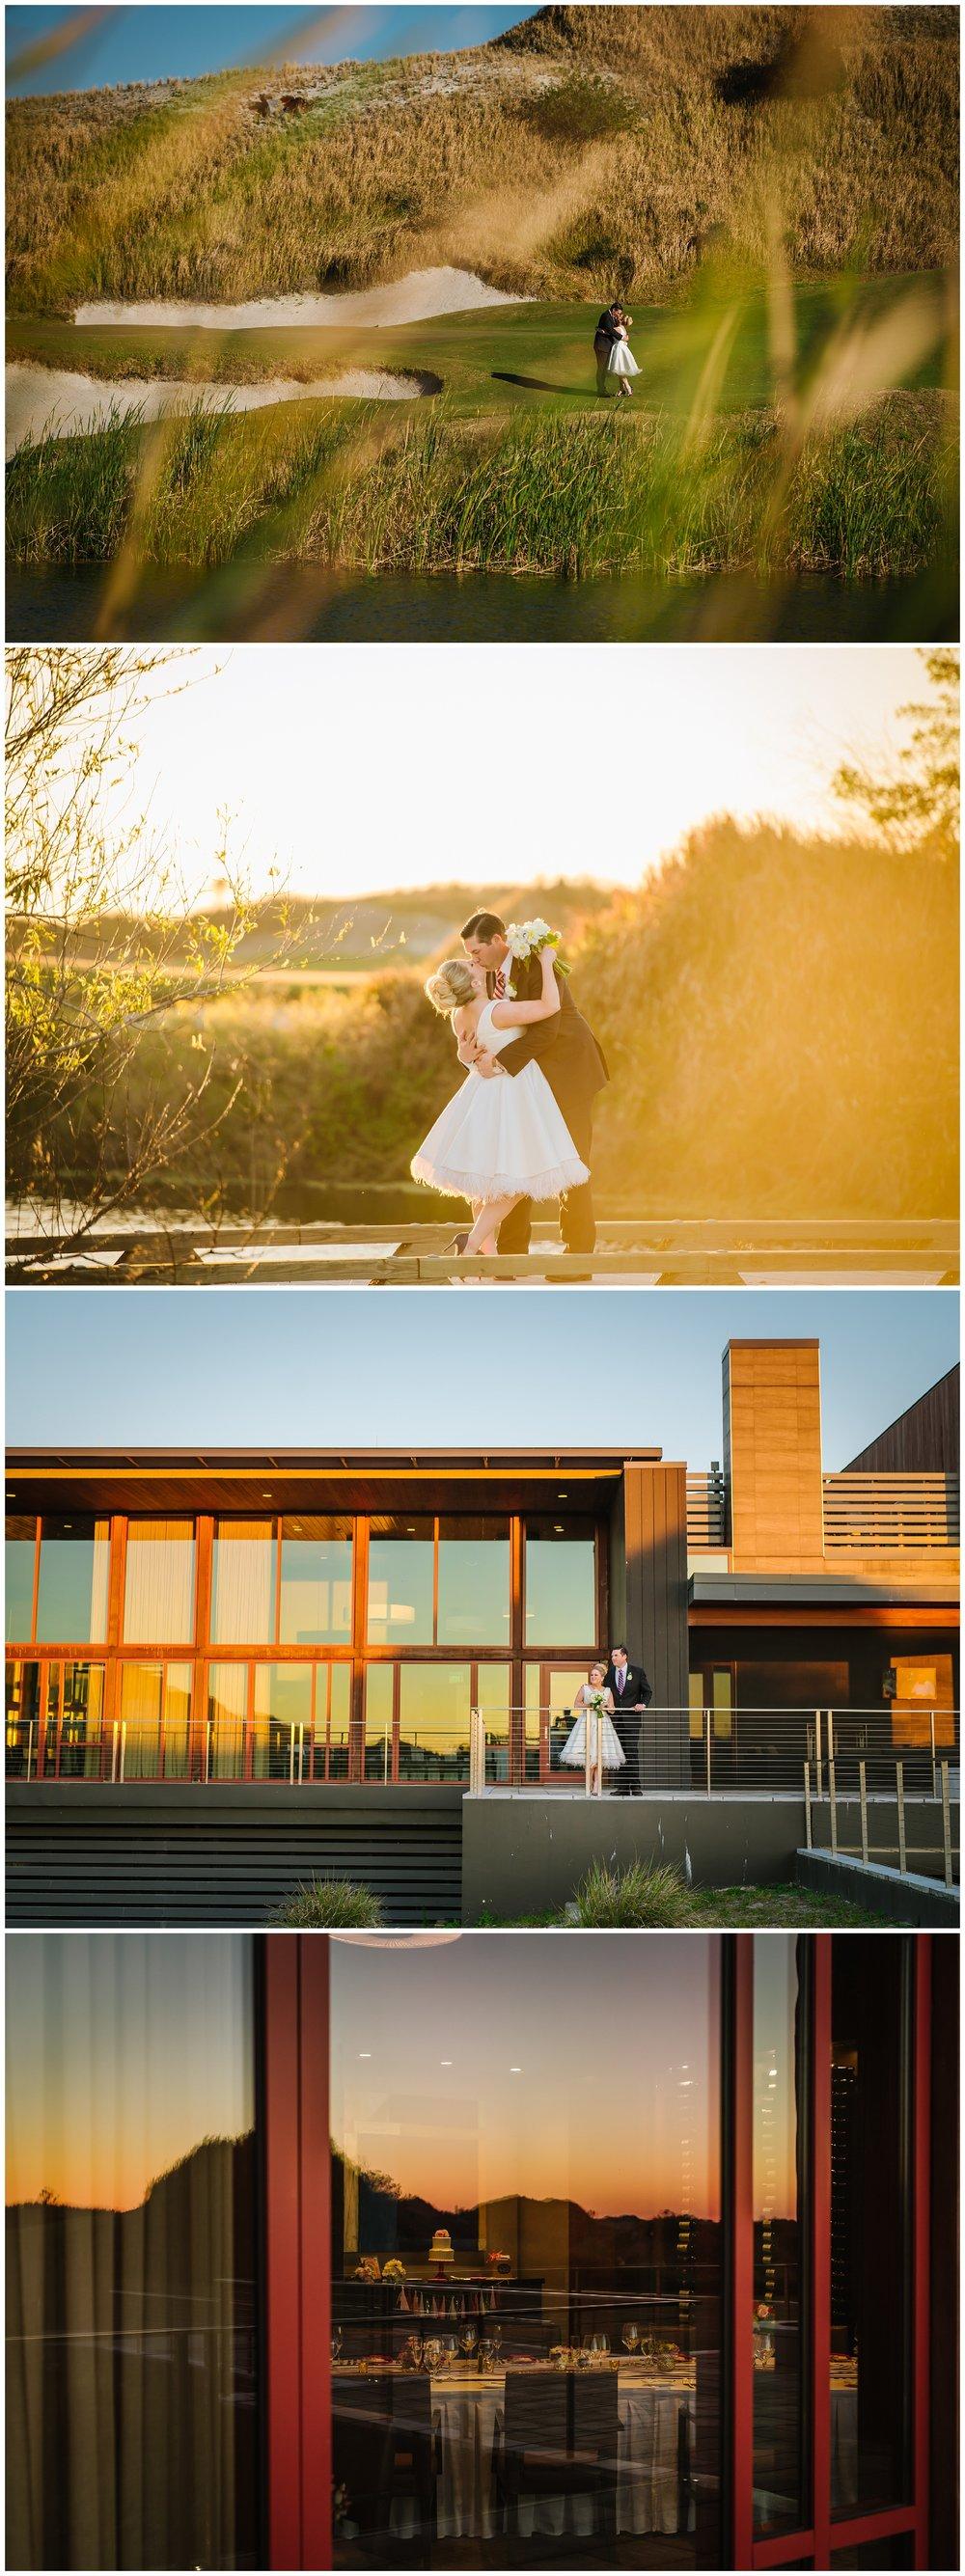 Ashlee-hamon-photography-year-in-review-2016-travel-wanderlust-vsco-adventure-wedding_0051.jpg